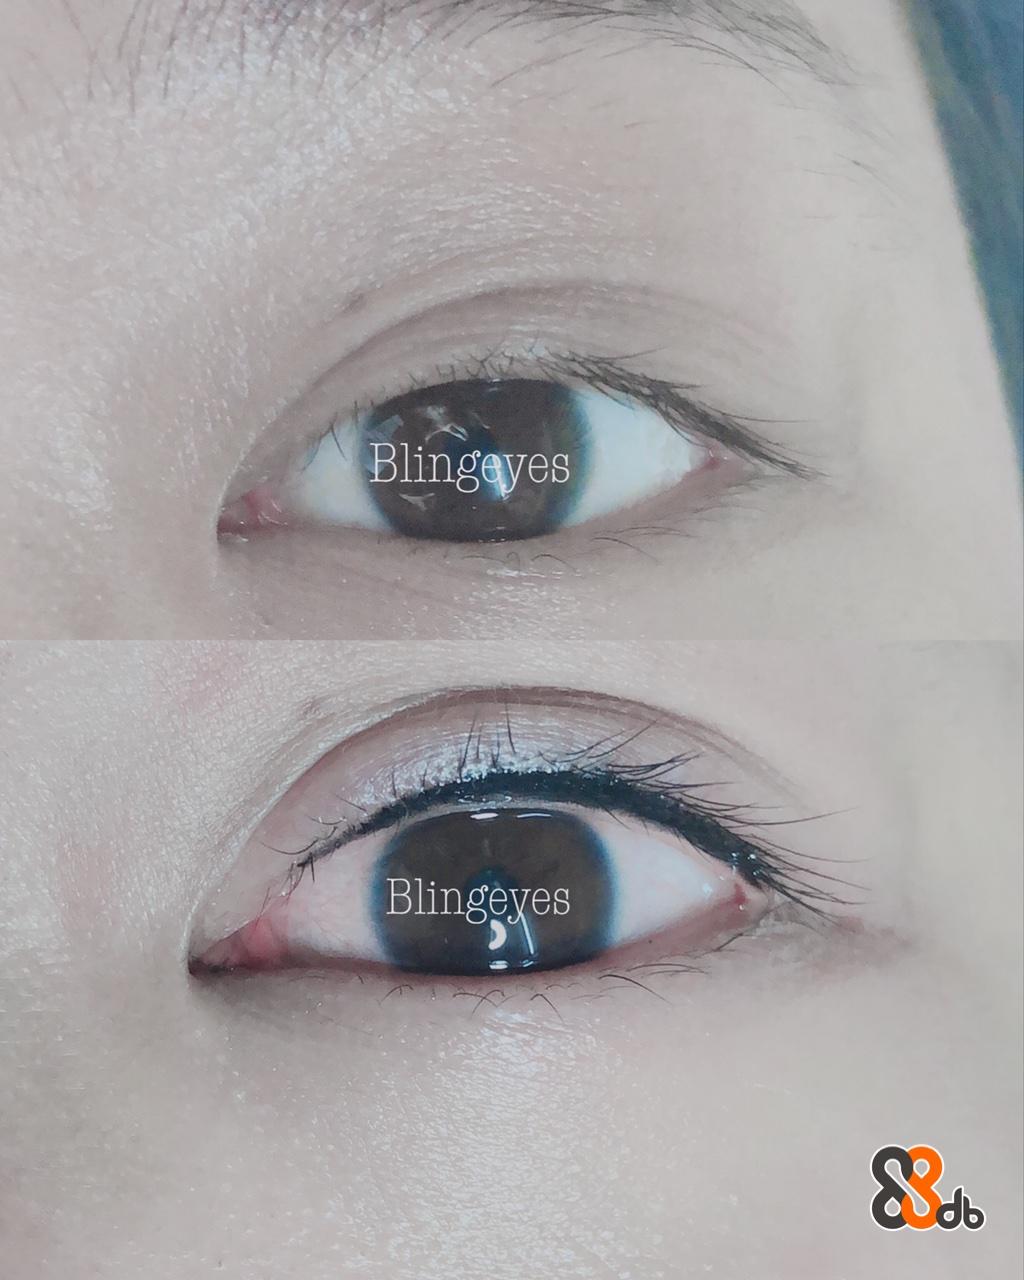 Blingayes Blingèves  Eyebrow,Eyelash,Eye,Face,Skin